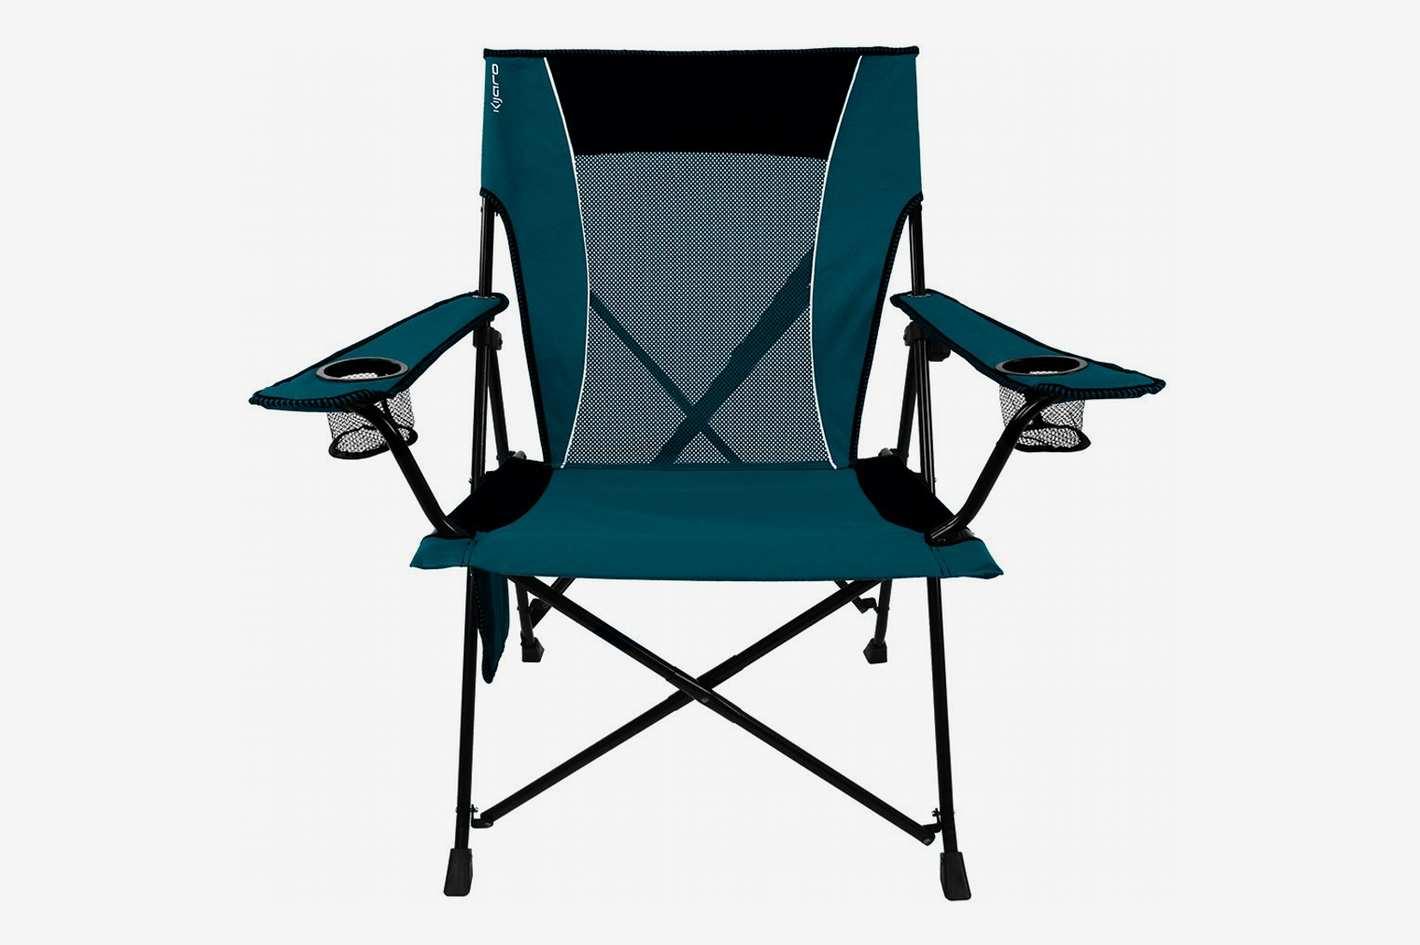 Kijaro Dual-Lock Portable Camping and Sports Chair